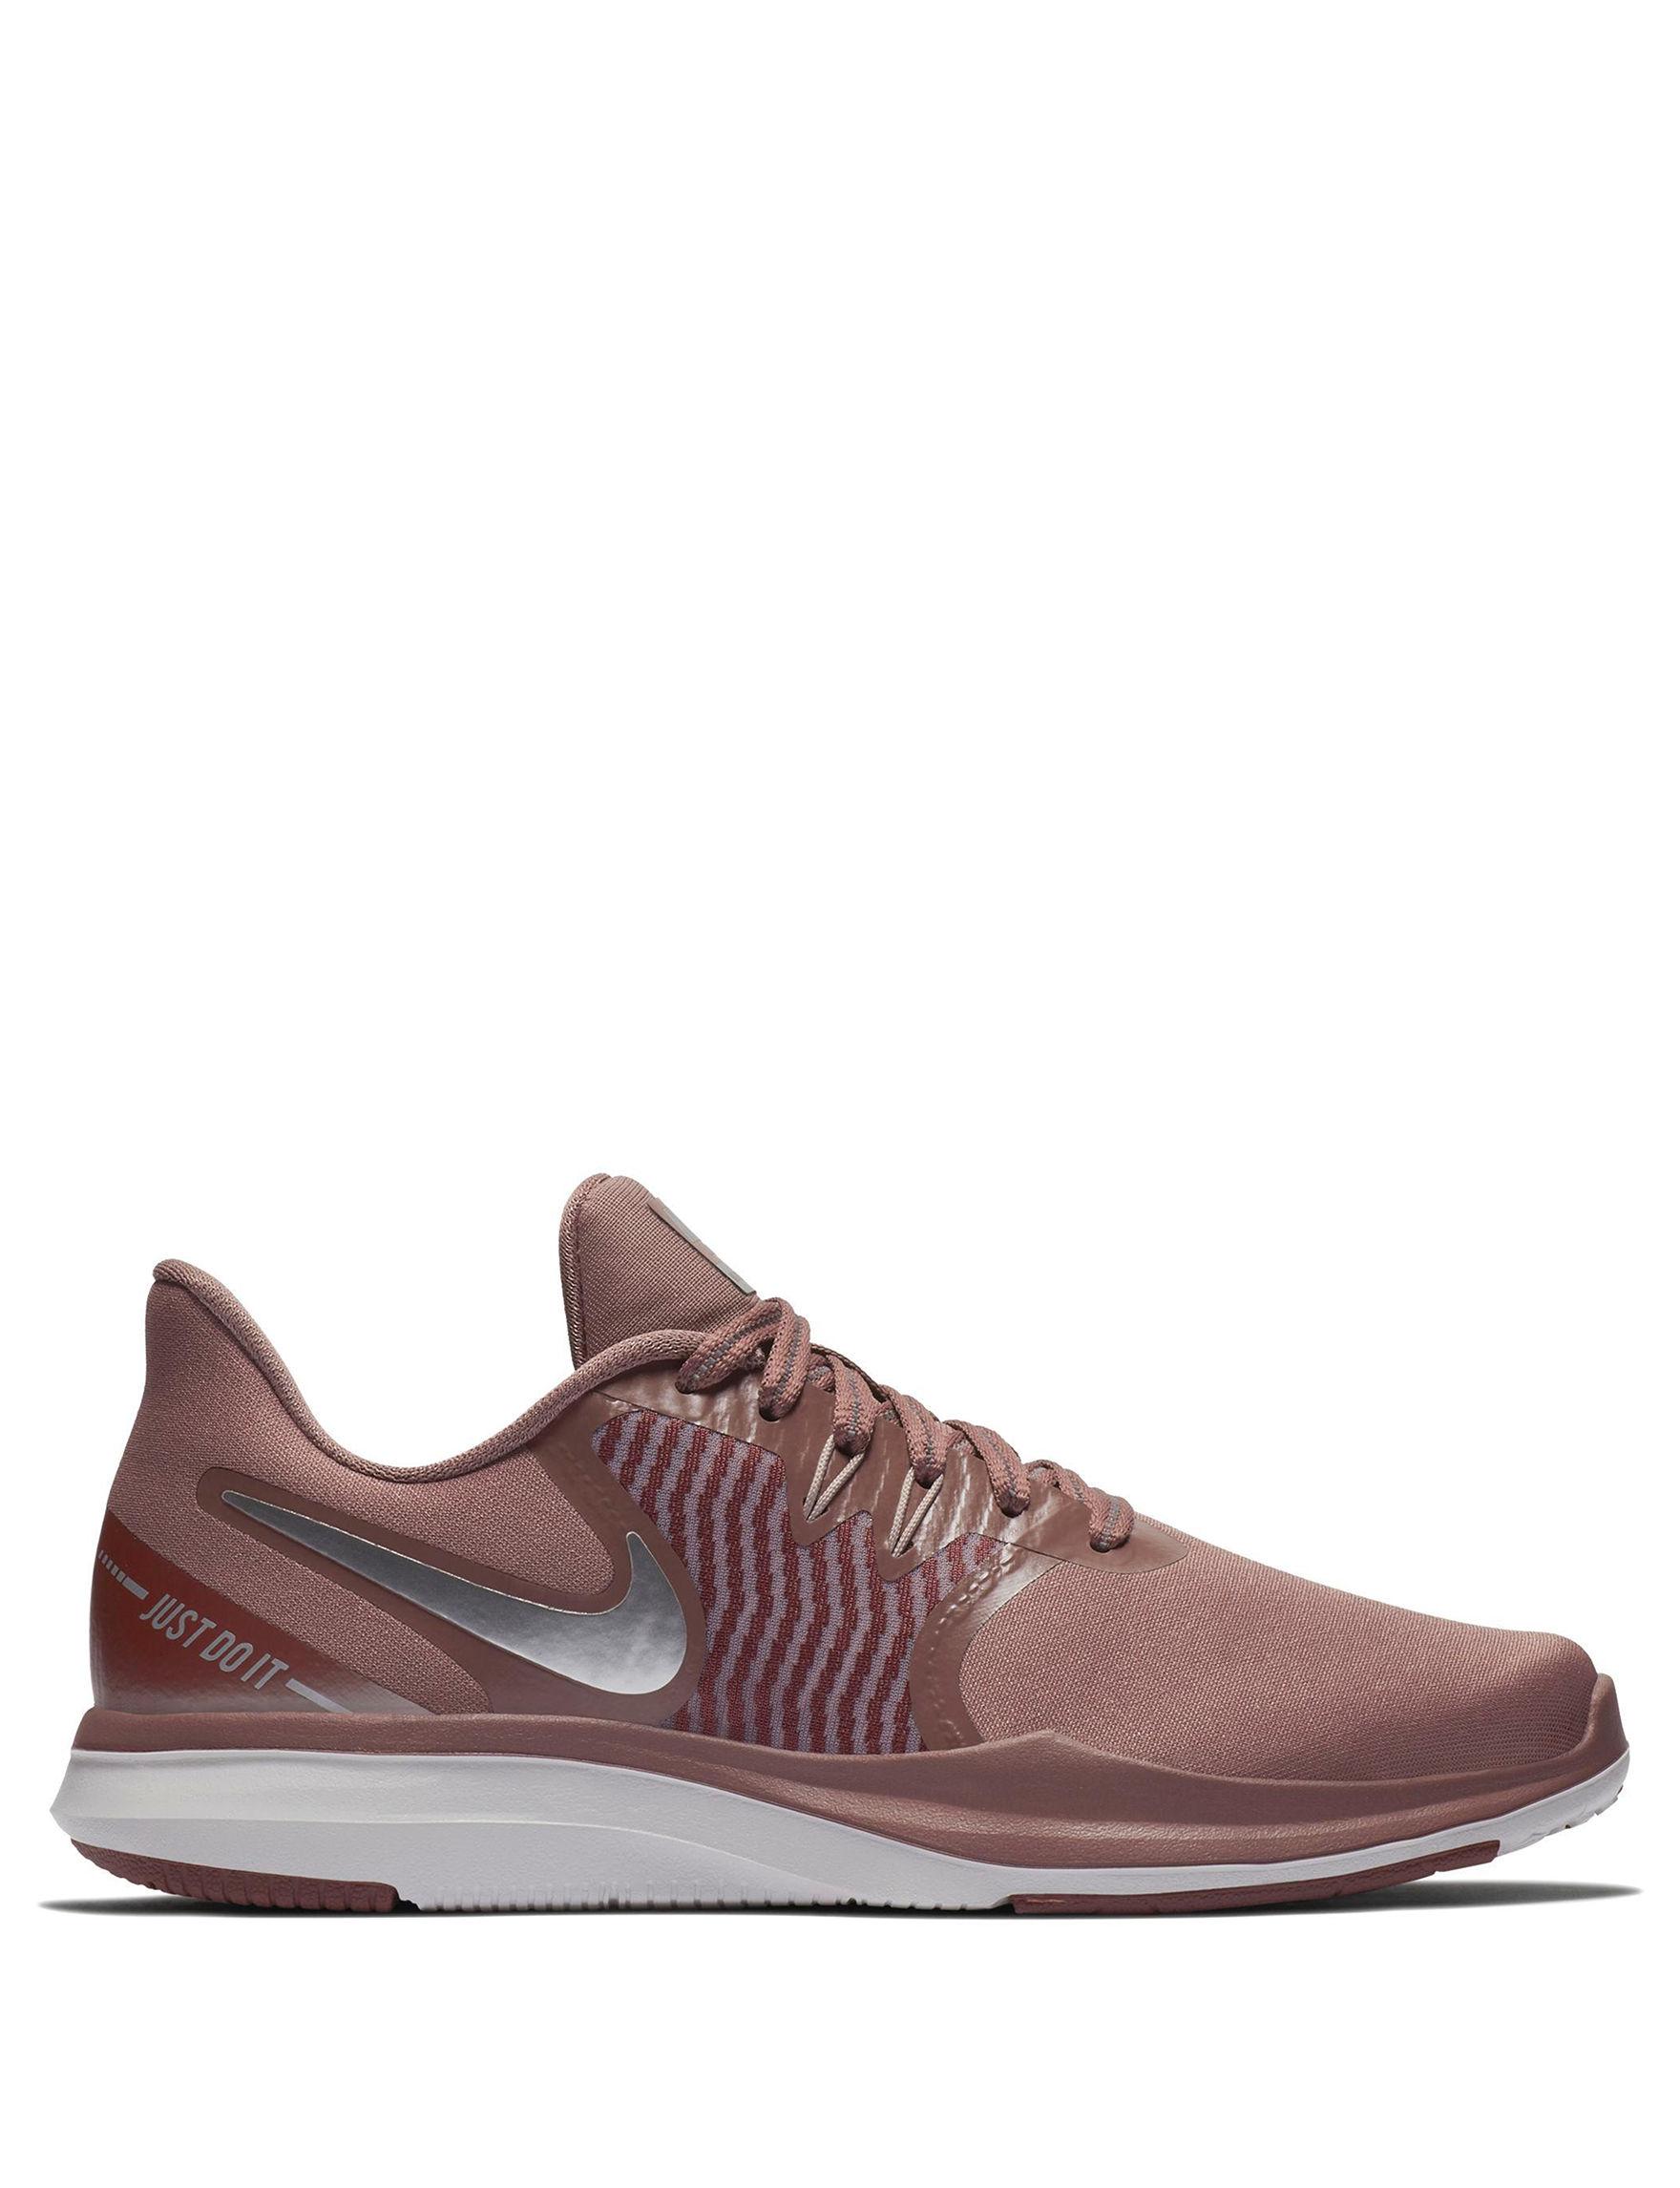 Nike Mauve Comfort